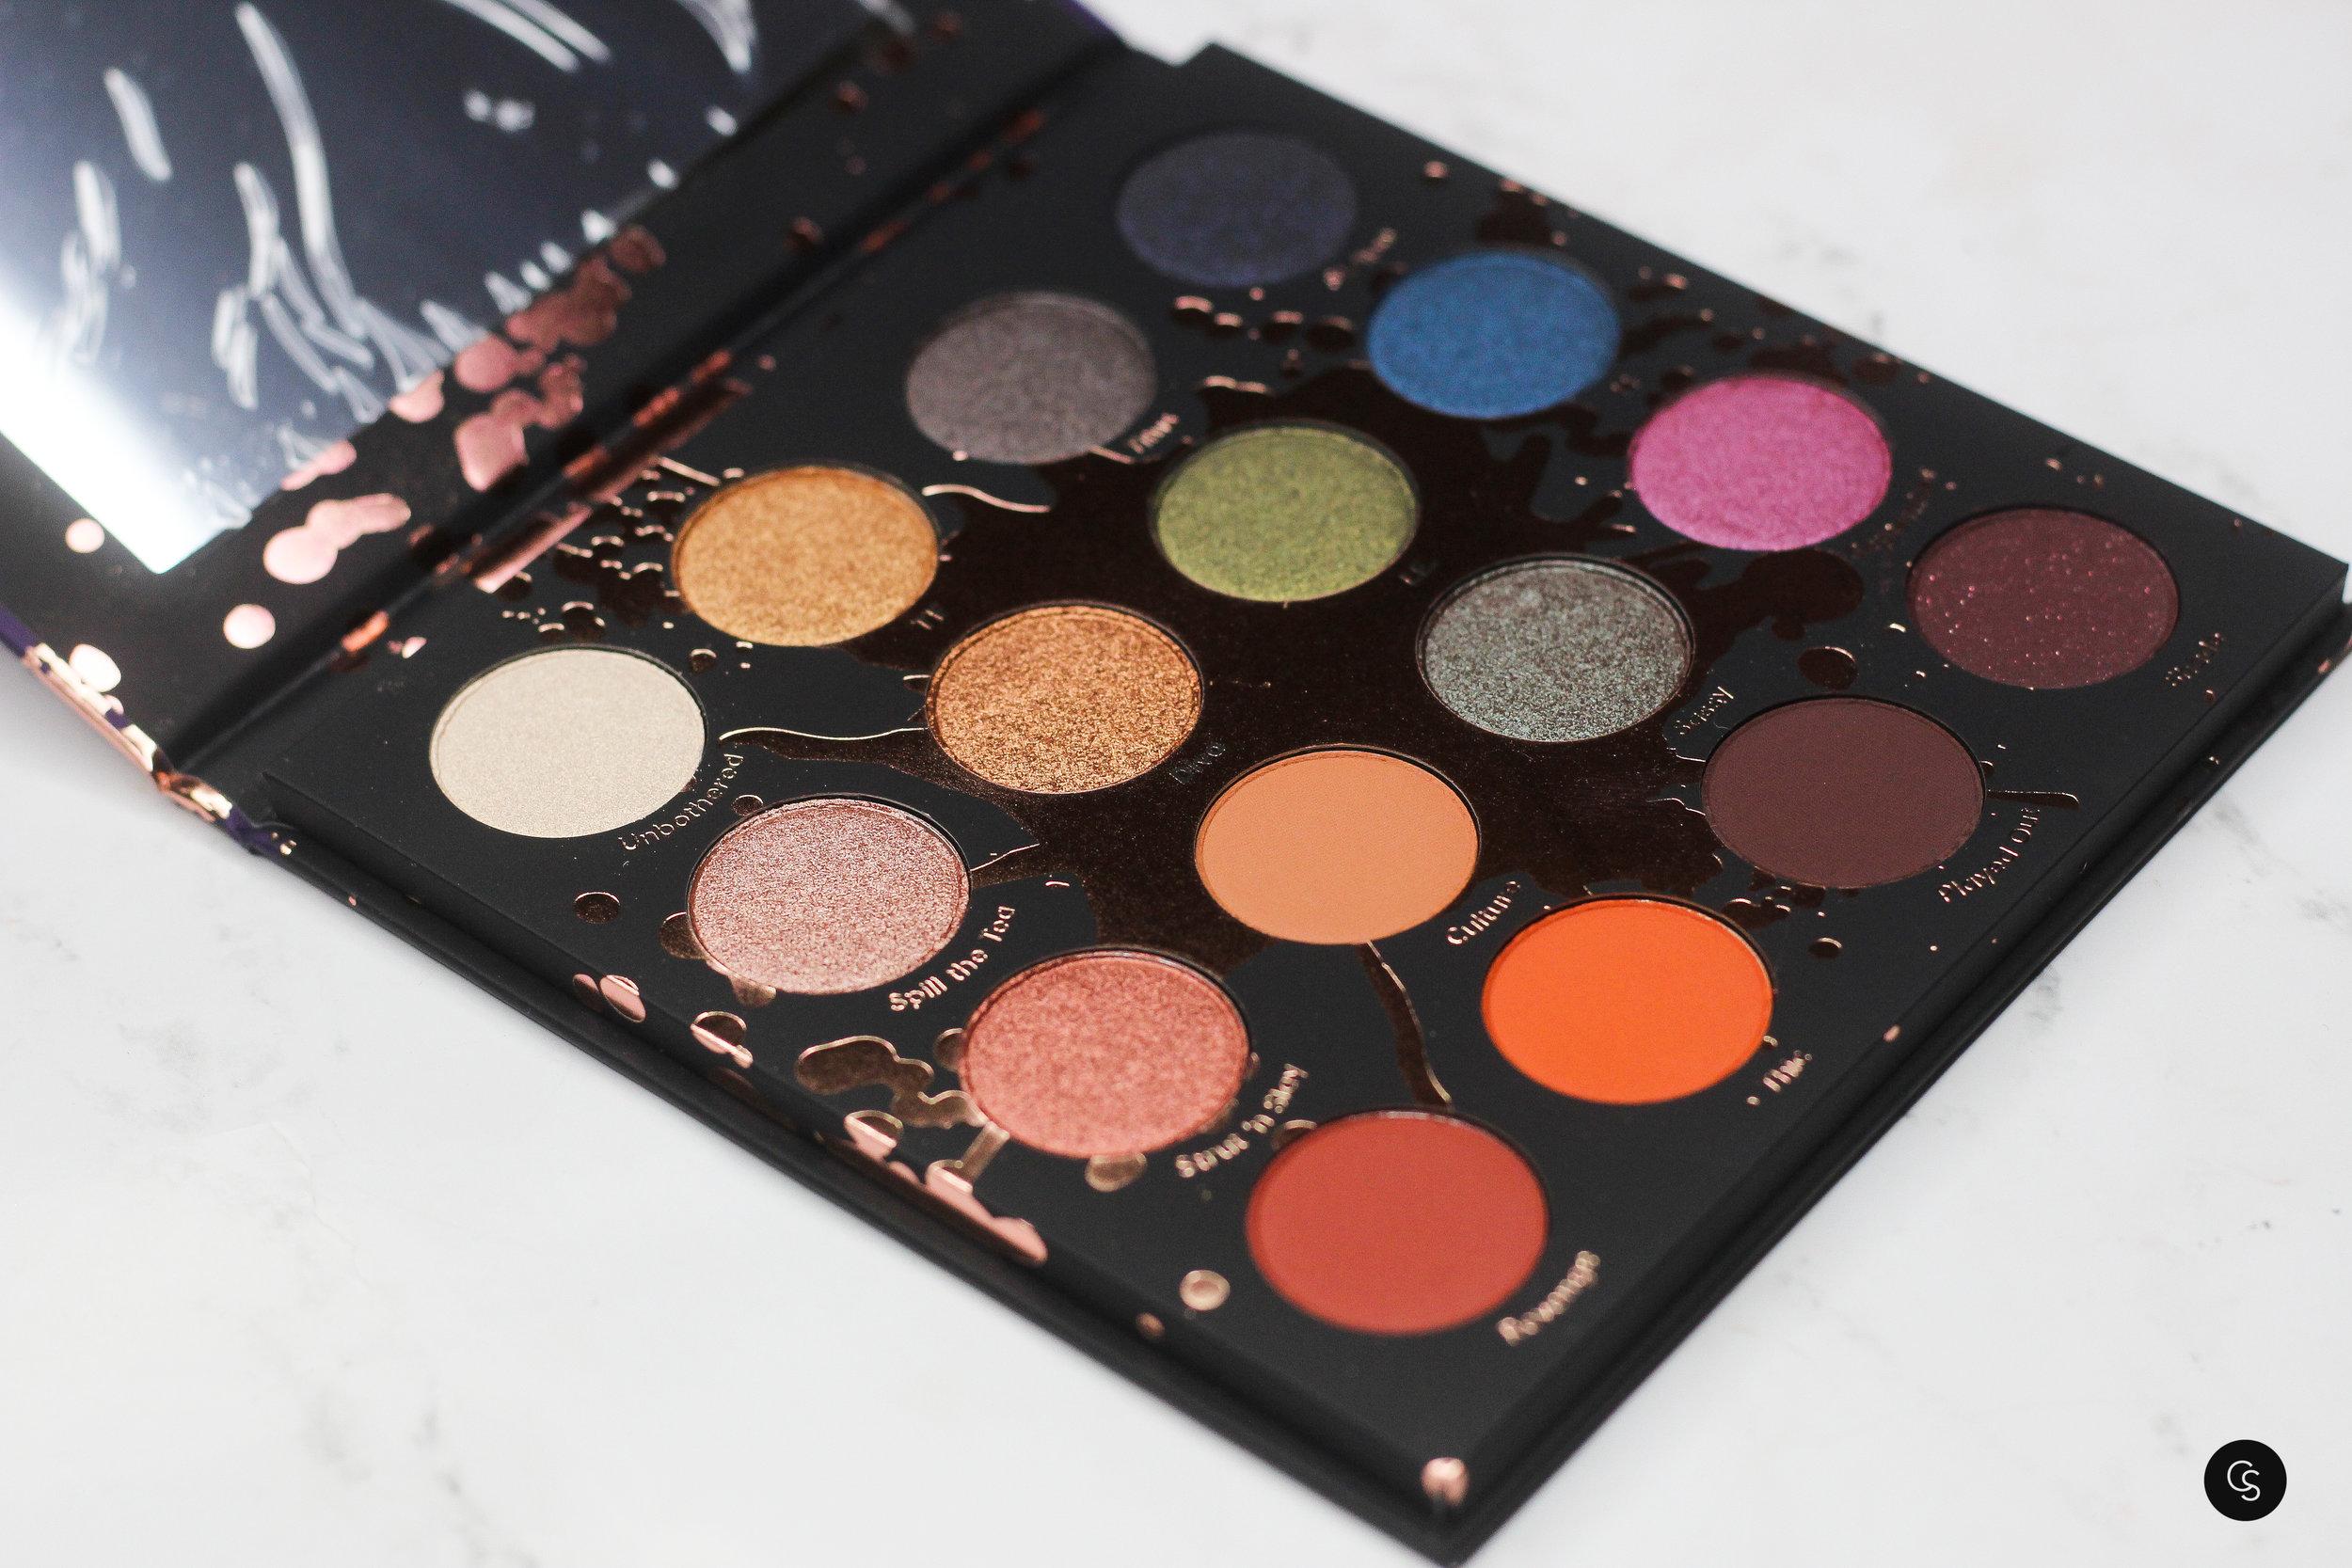 Perception Makeup Shayla X Colourpop Eye Shadow Palette Cocoa